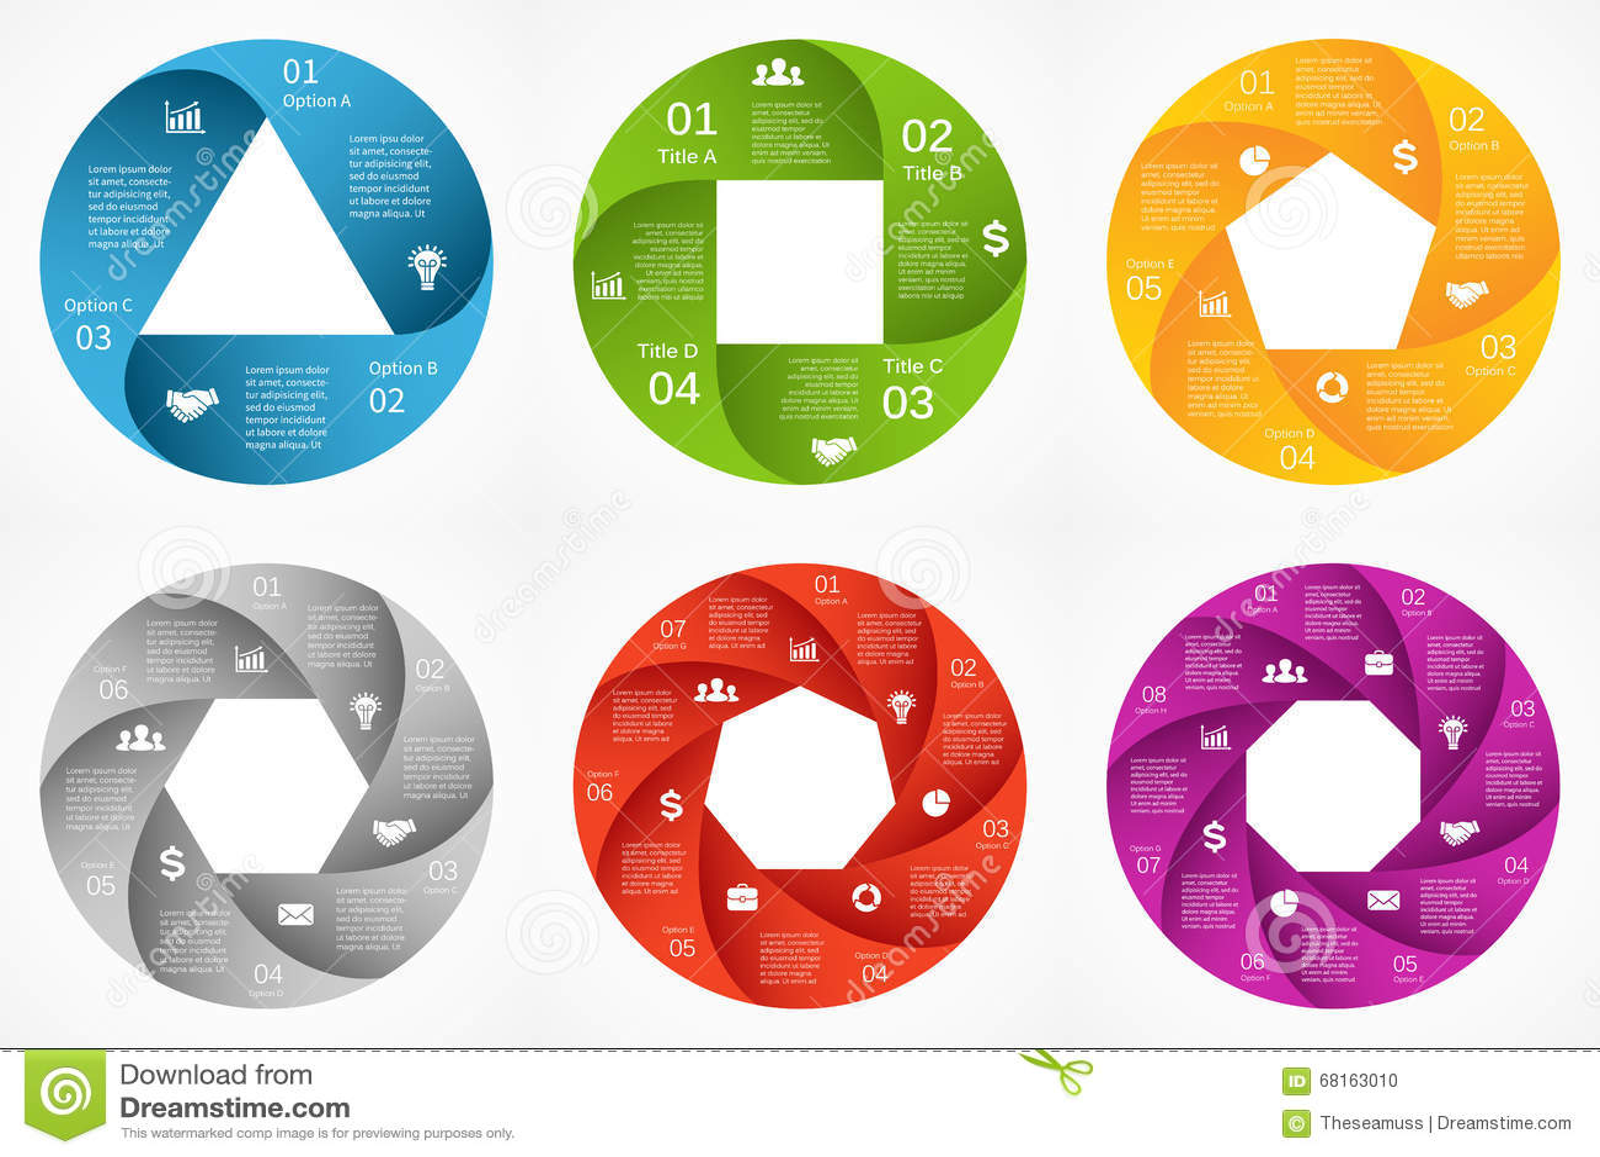 Thumbsdreamstimezvector circle arrows infog ccuart Choice Image